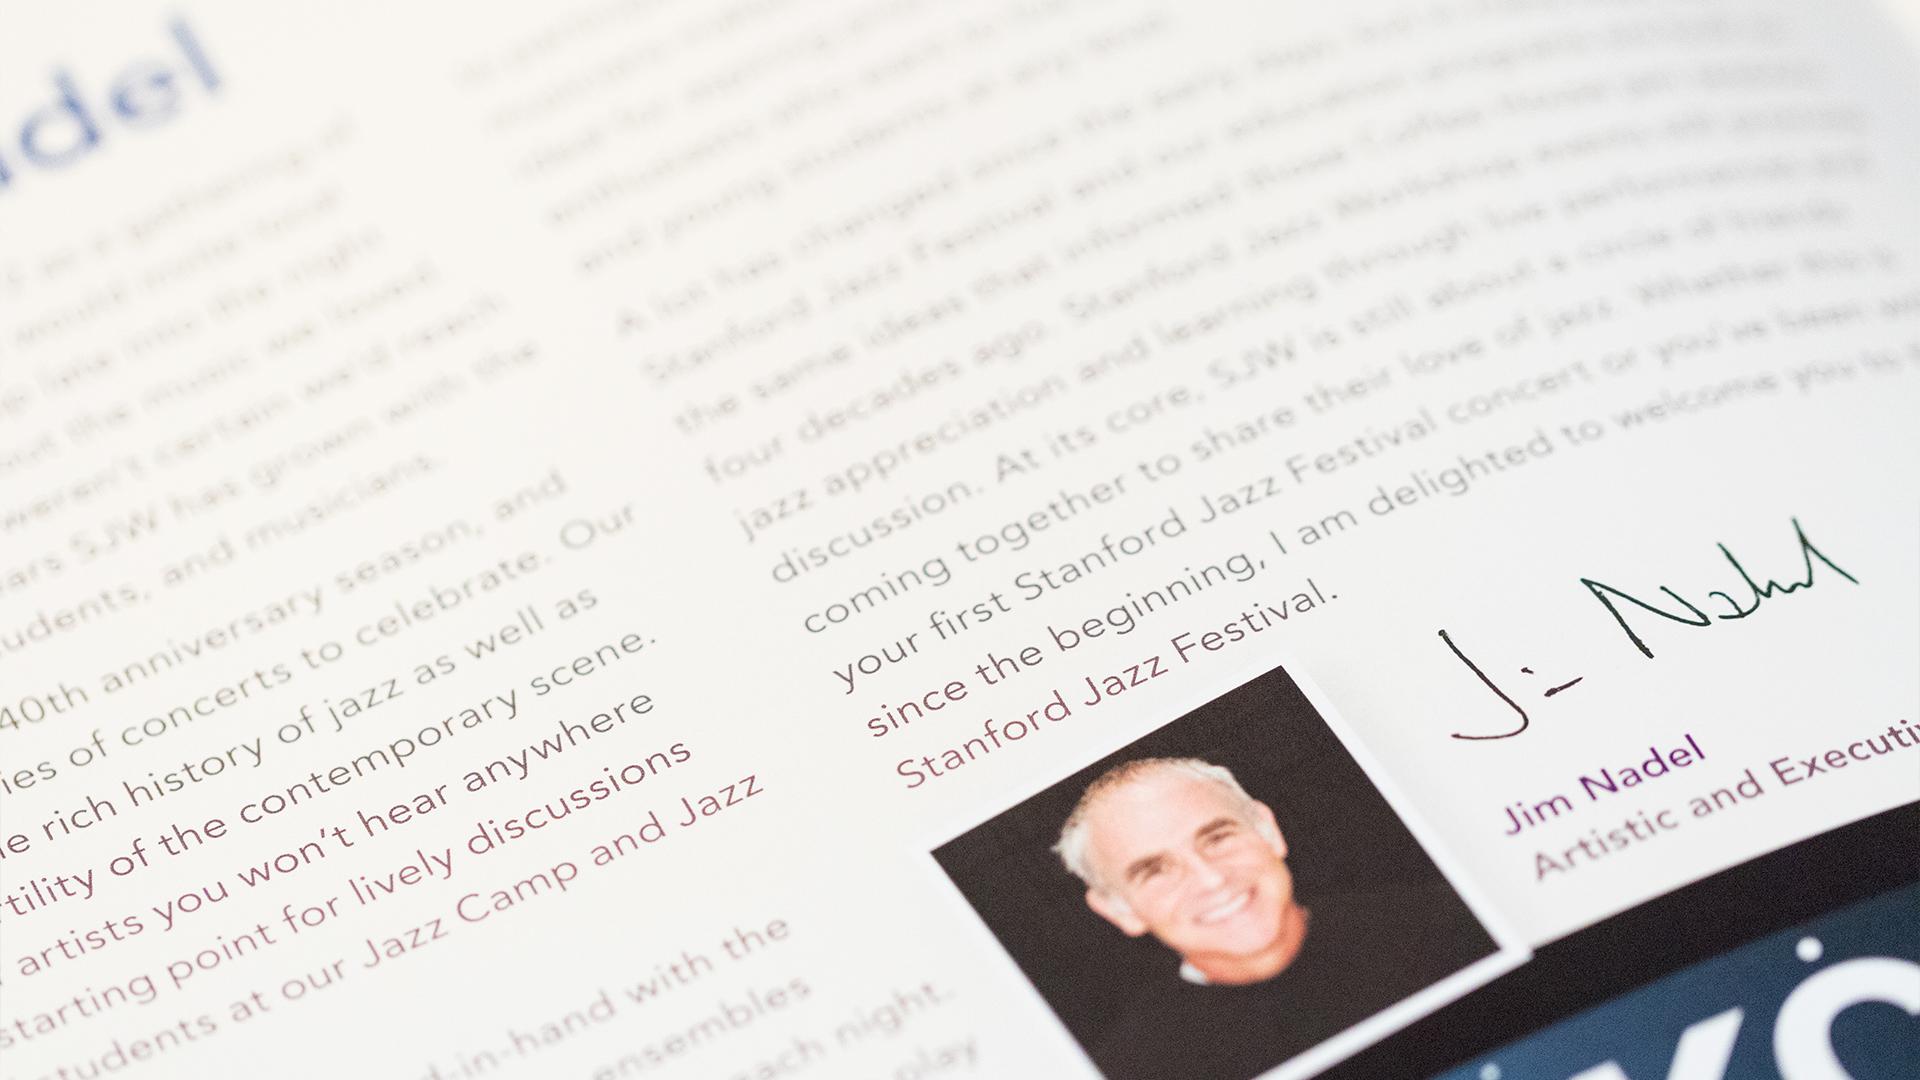 Print – Festival Program – Pages 1-2 (Jim Nadel Close-Up)